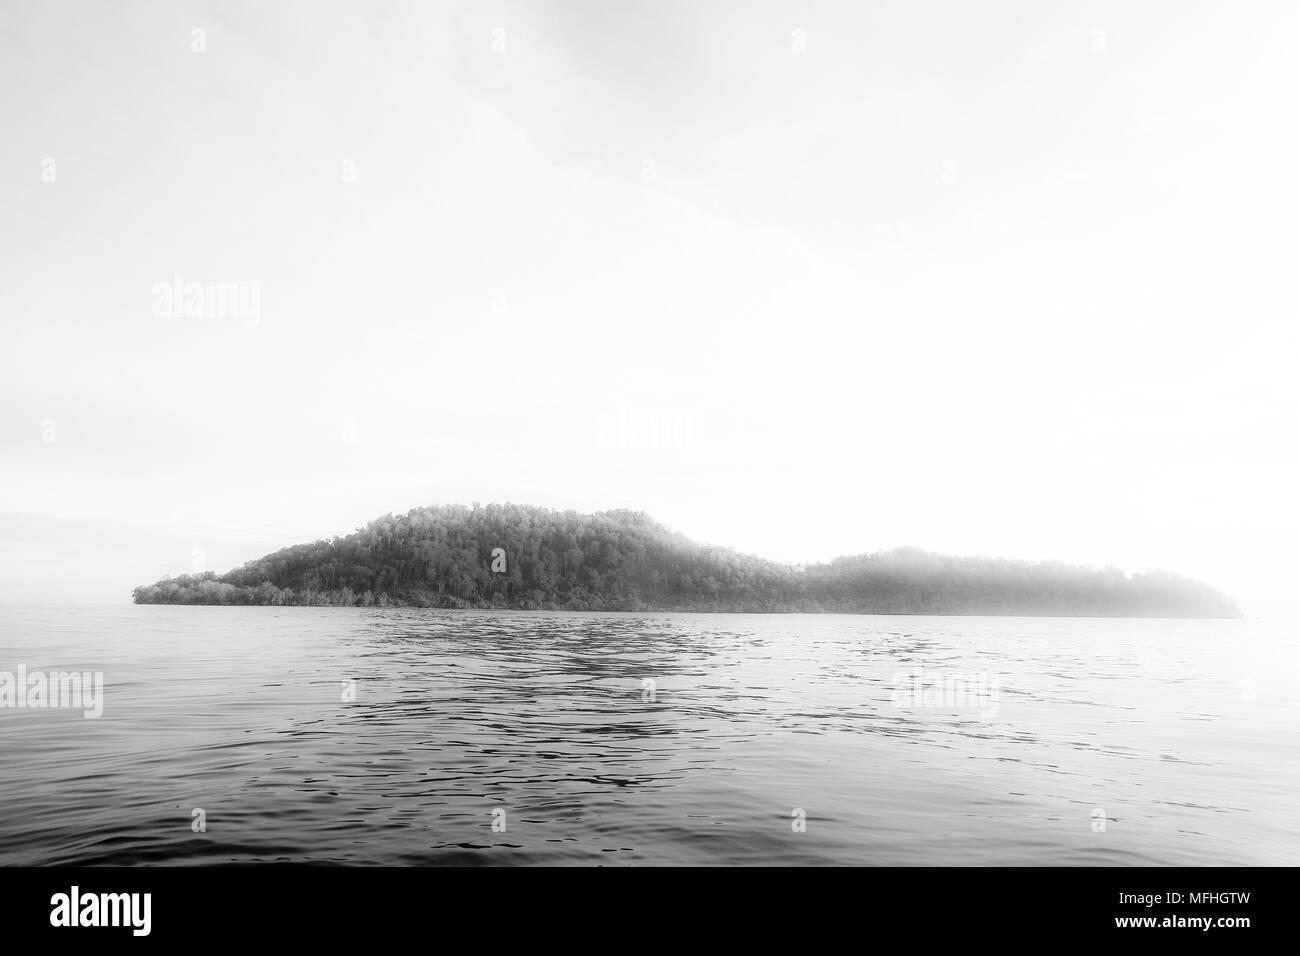 Inhabited island. Indonesia - Stock Image